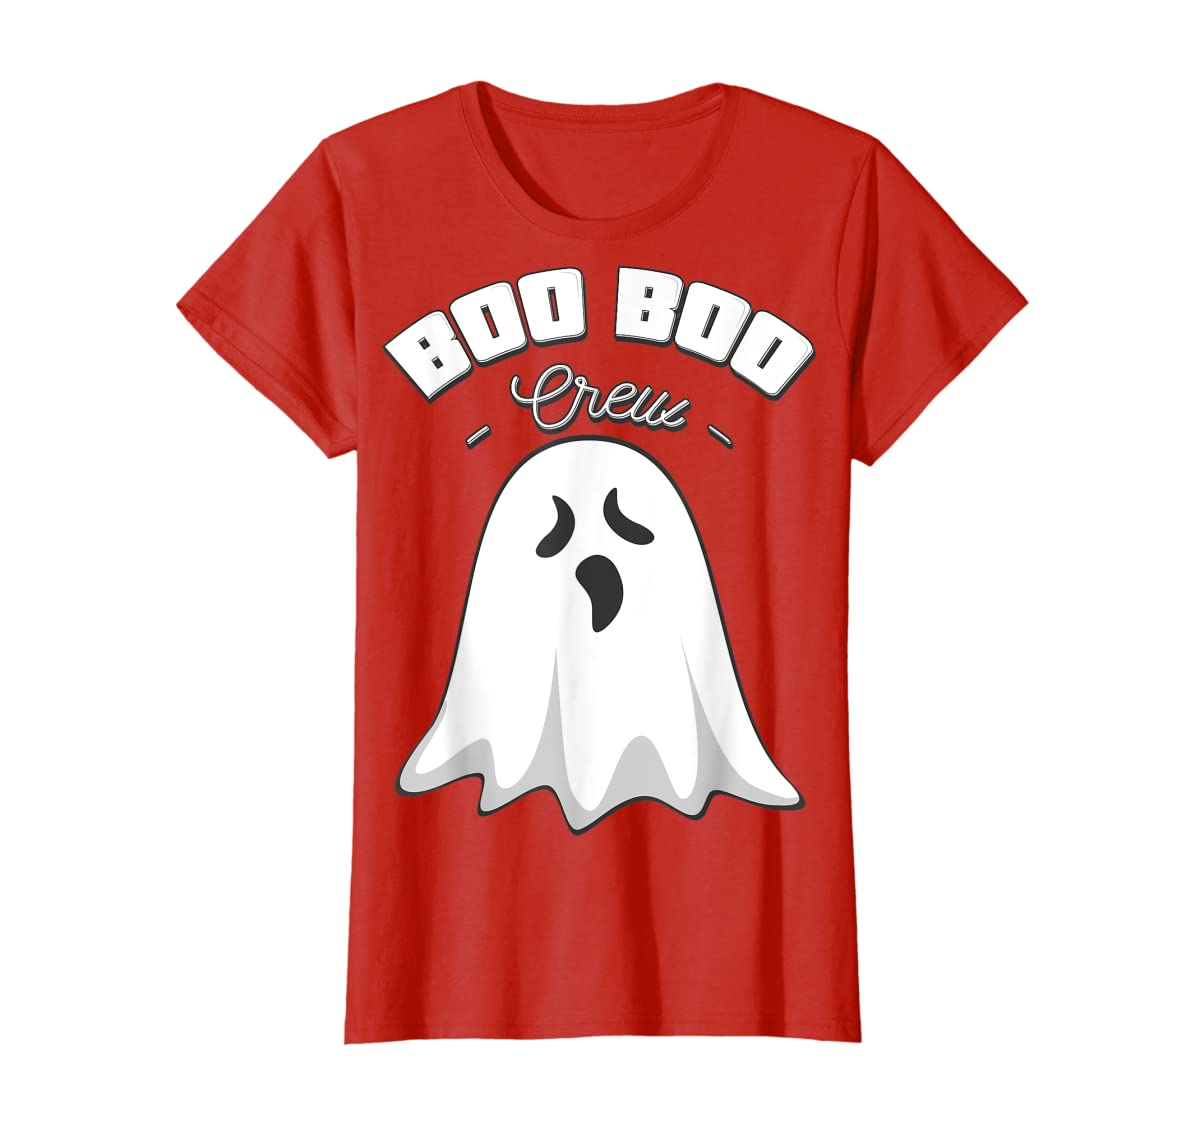 Boo Boo Crew Ghost Funny Halloween Black and Orange Night T-Shirt-Women's T-Shirt-Red